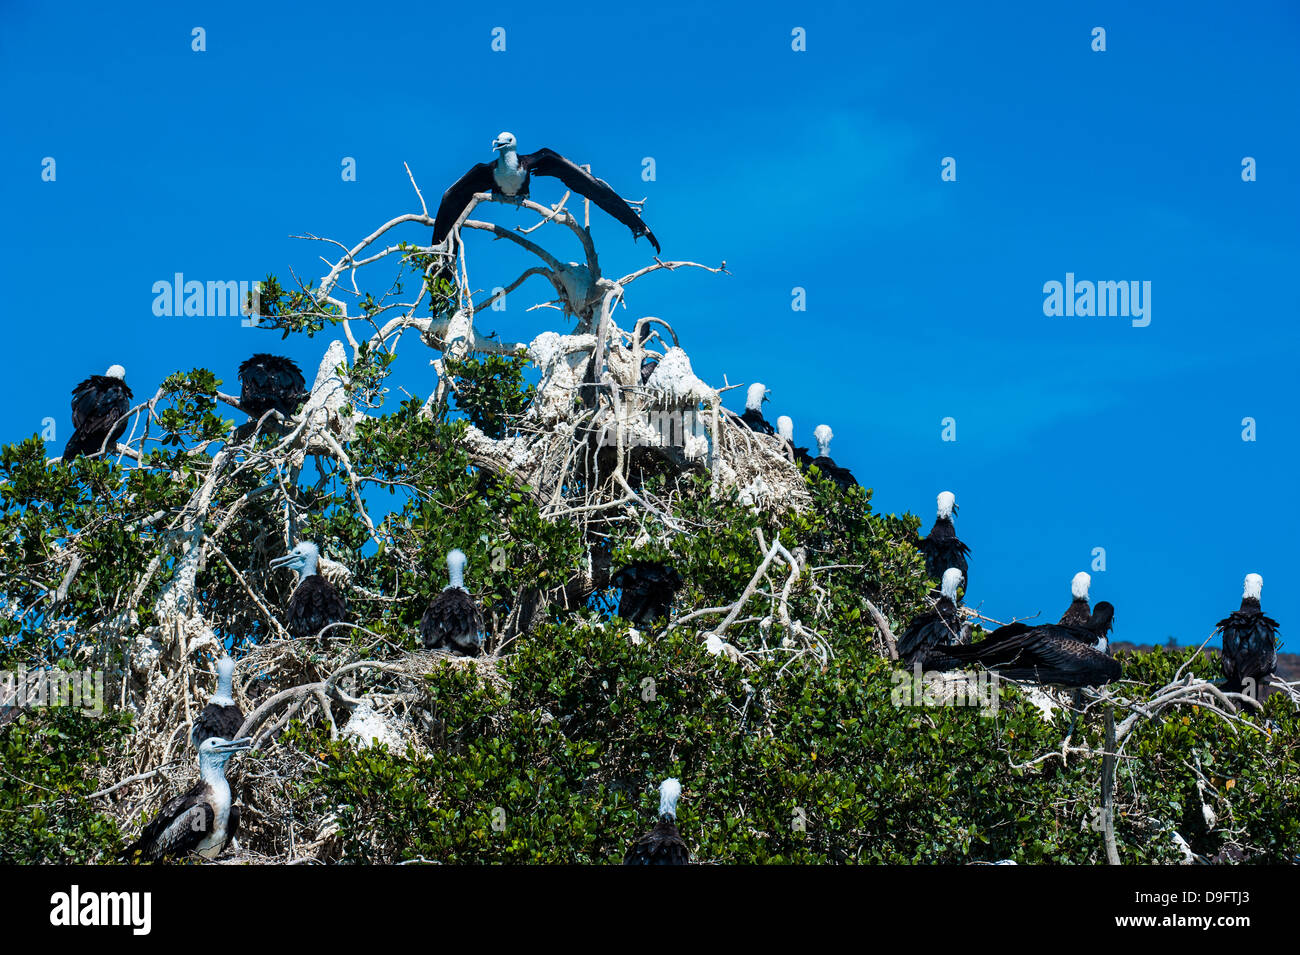 Fregattvögel Kolonie auf Isla Espiritu Santo, Baja California, Mexiko Stockbild